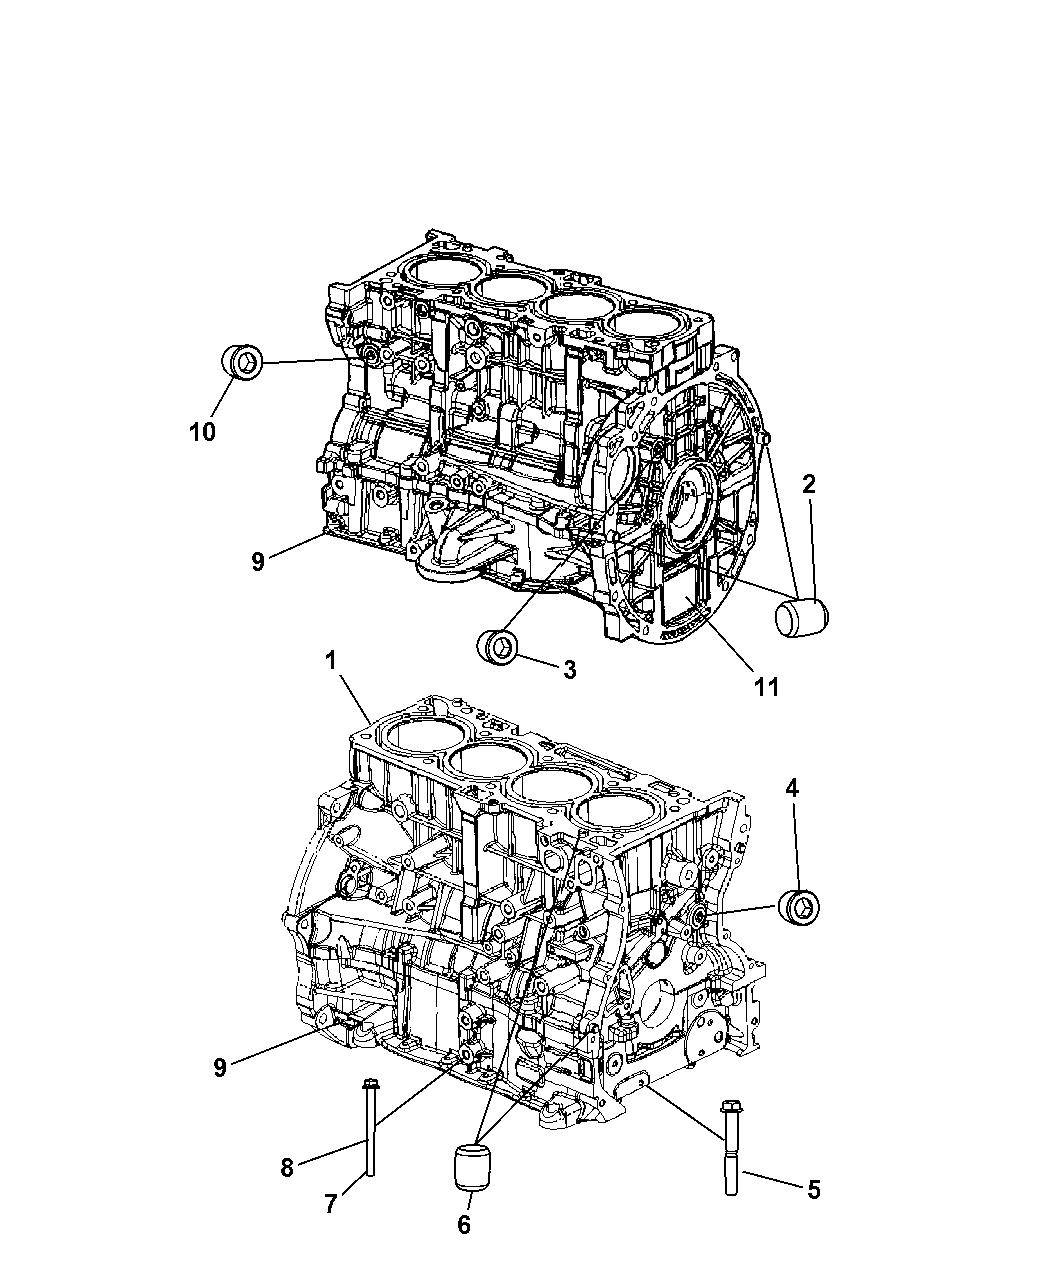 2008 Dodge Caliber Engine Cylinder Block And Hardware Diagram Thumbnail 2